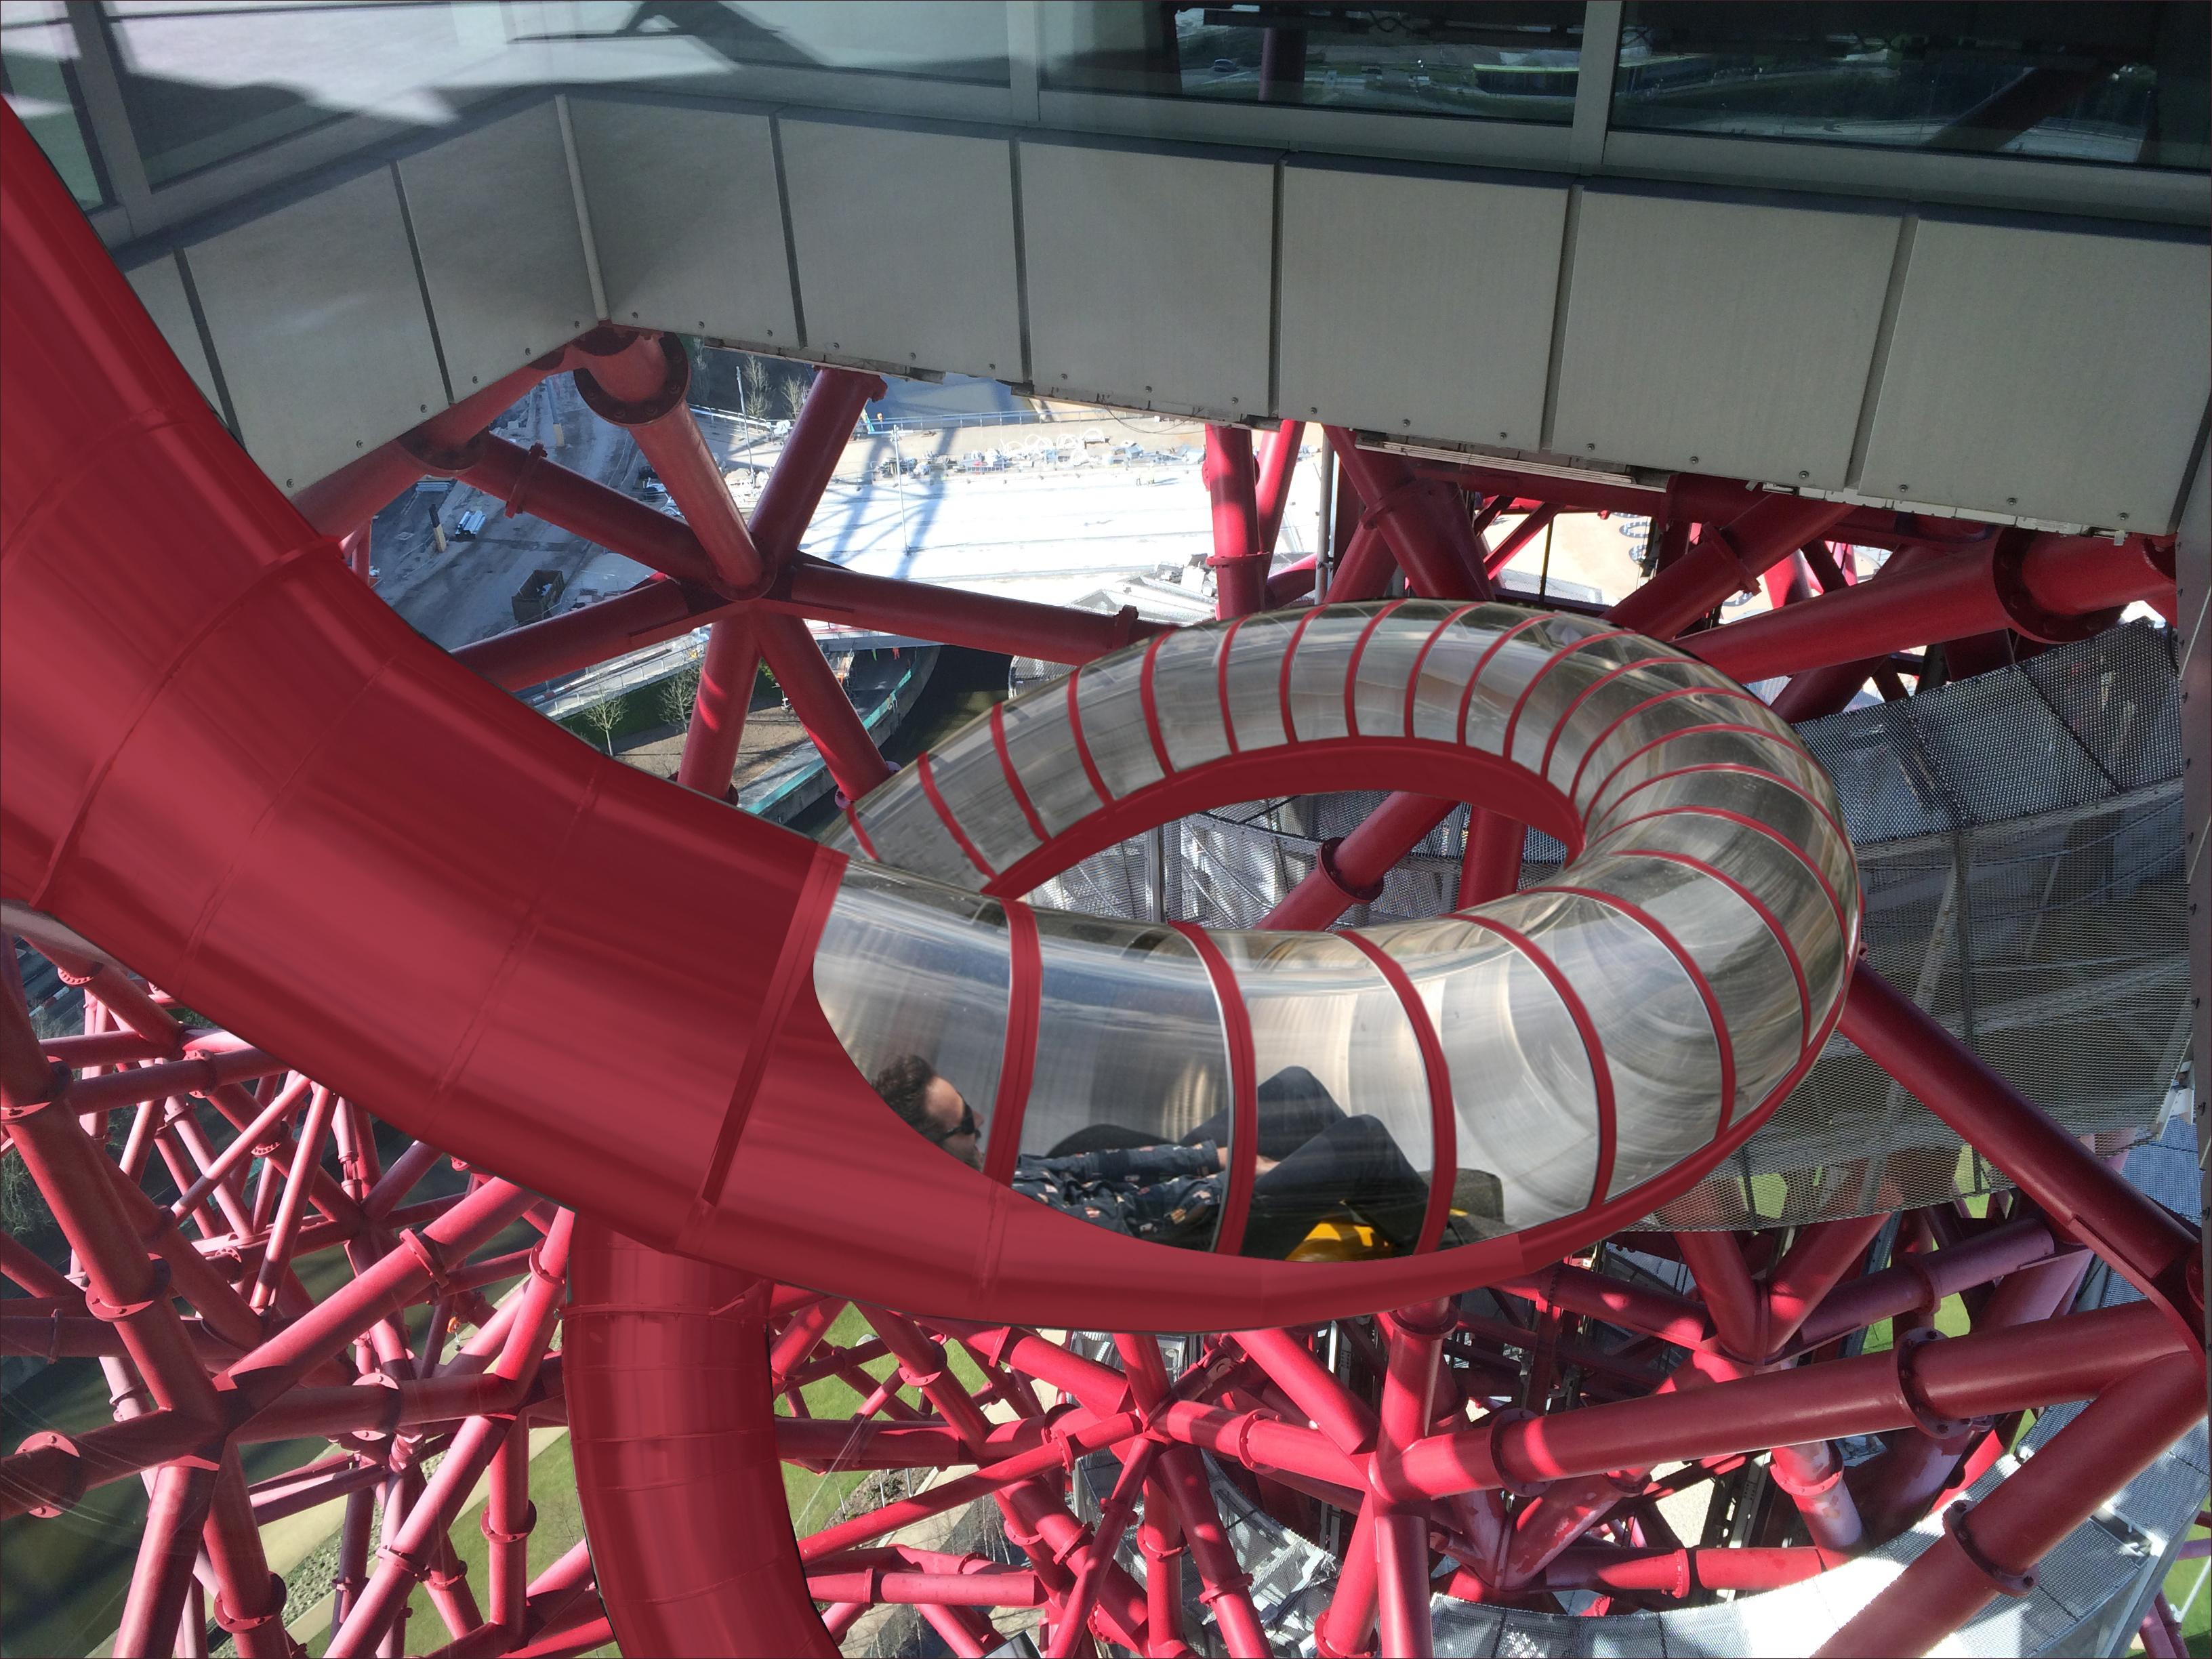 Top of slide ArcelorMittal Orbit